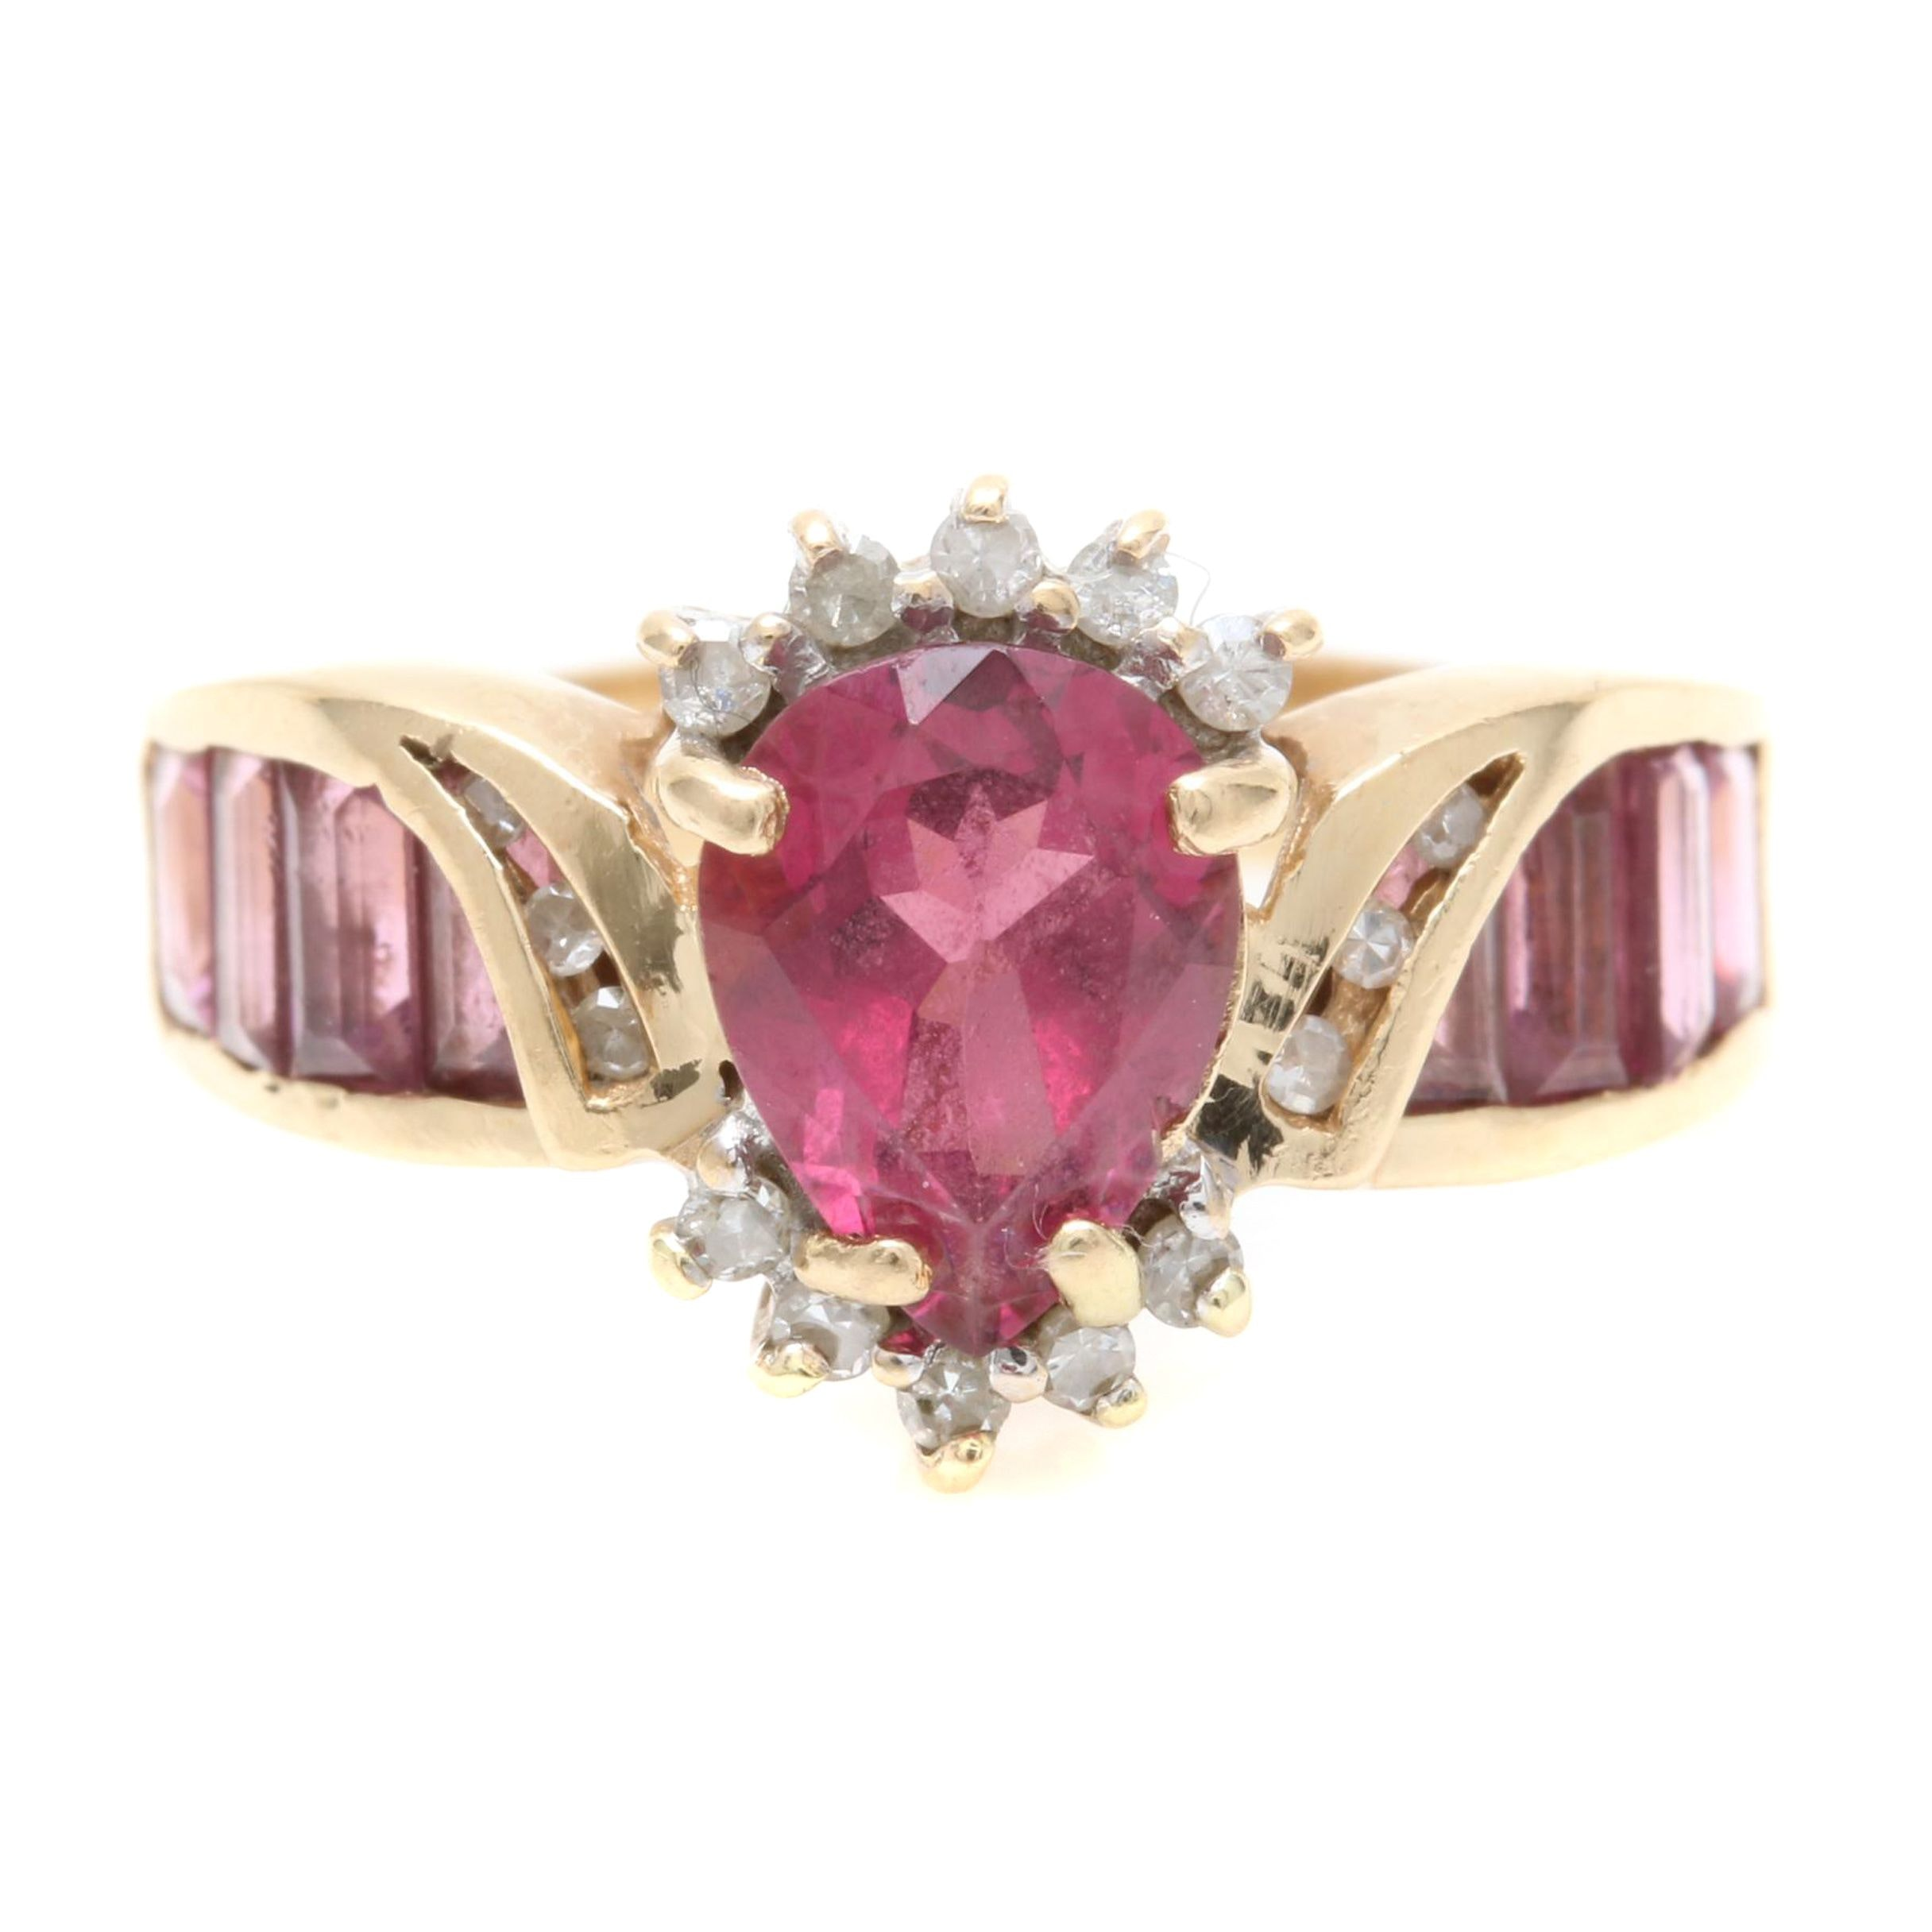 14K Yellow Gold Rhodolite Garnet and Diamond Ring